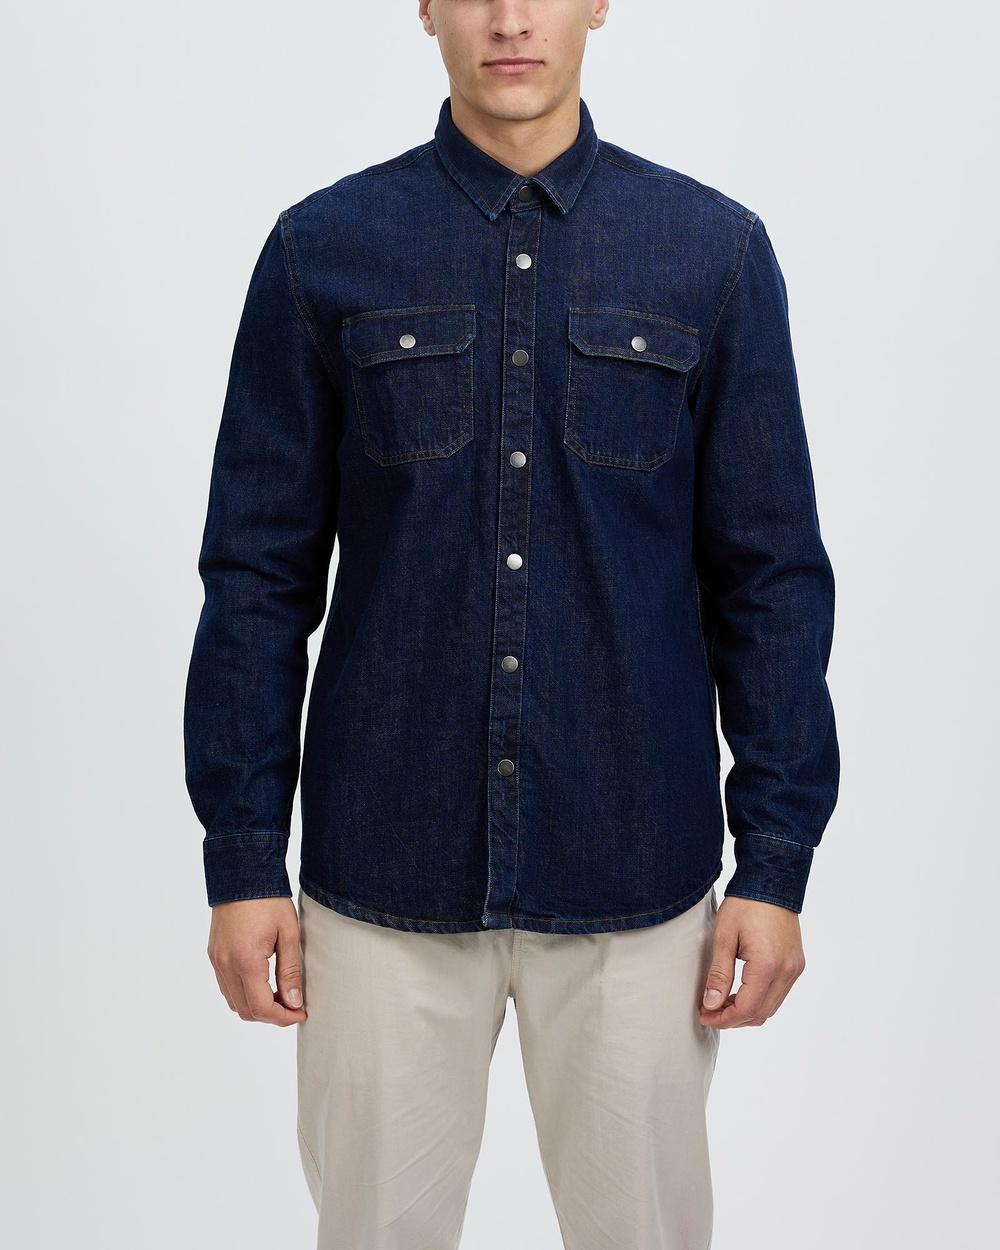 Marcs Hank Denim Overshirt Casual shirts DENIM